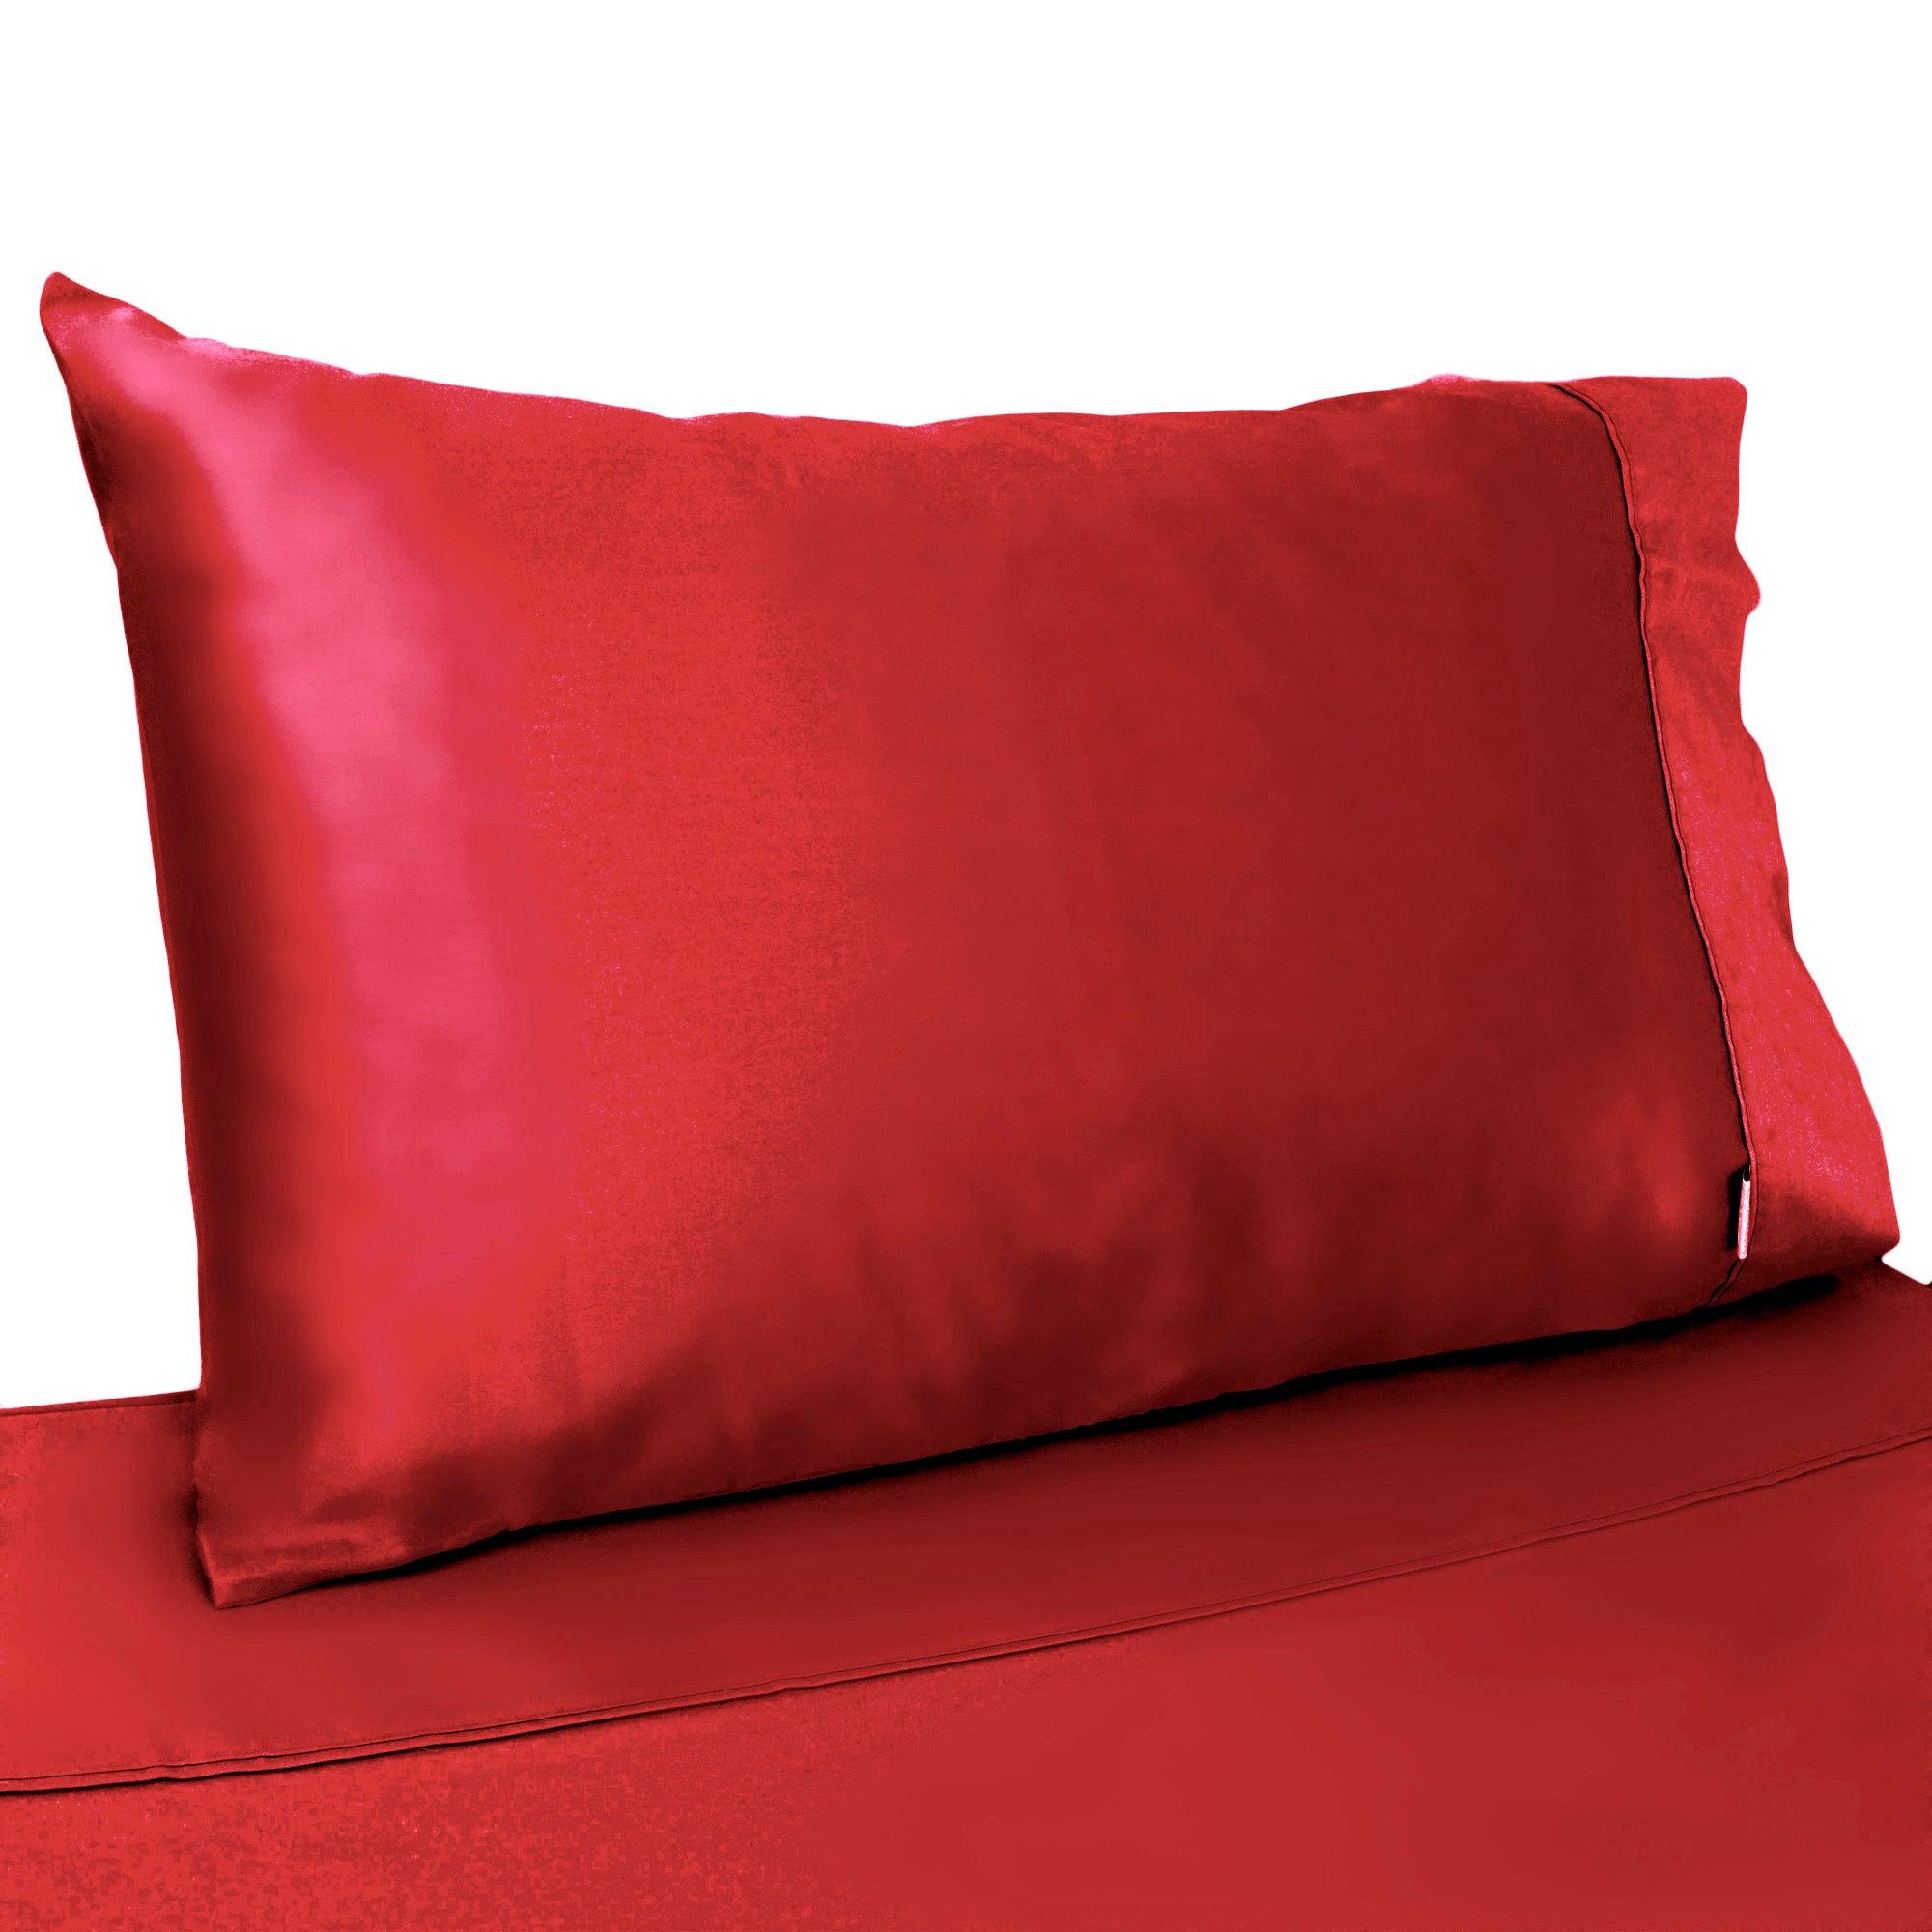 Dorma 350 Thread Count Red Plain Dye Collection Cuffed Pillowcase